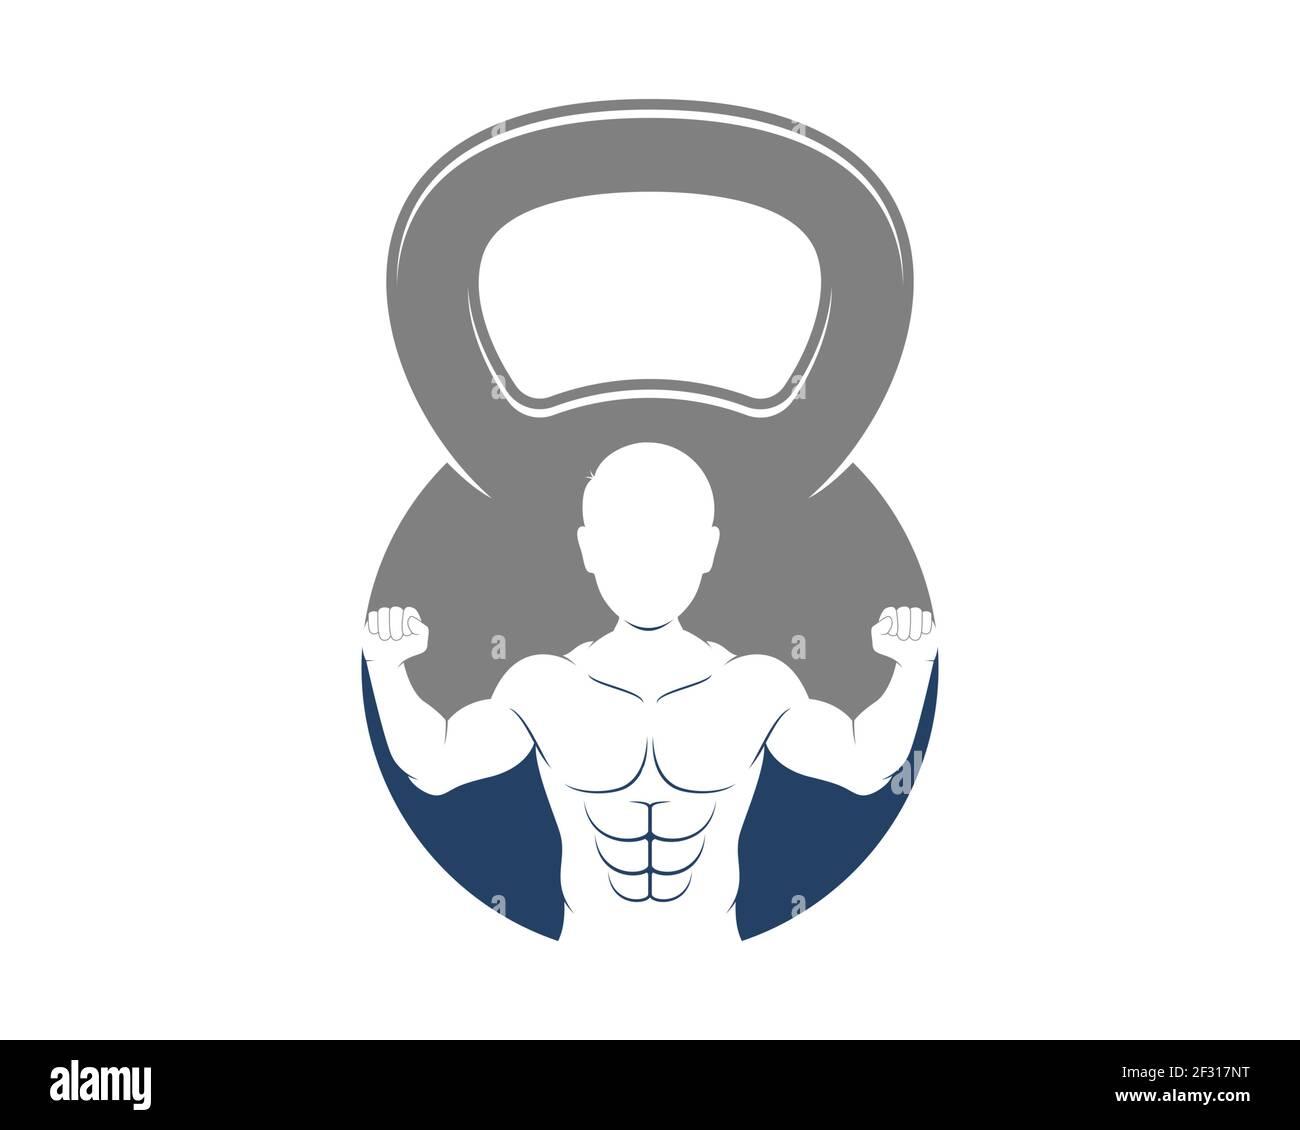 Hombre fuerte dentro de la campana de la caldera Foto de stock